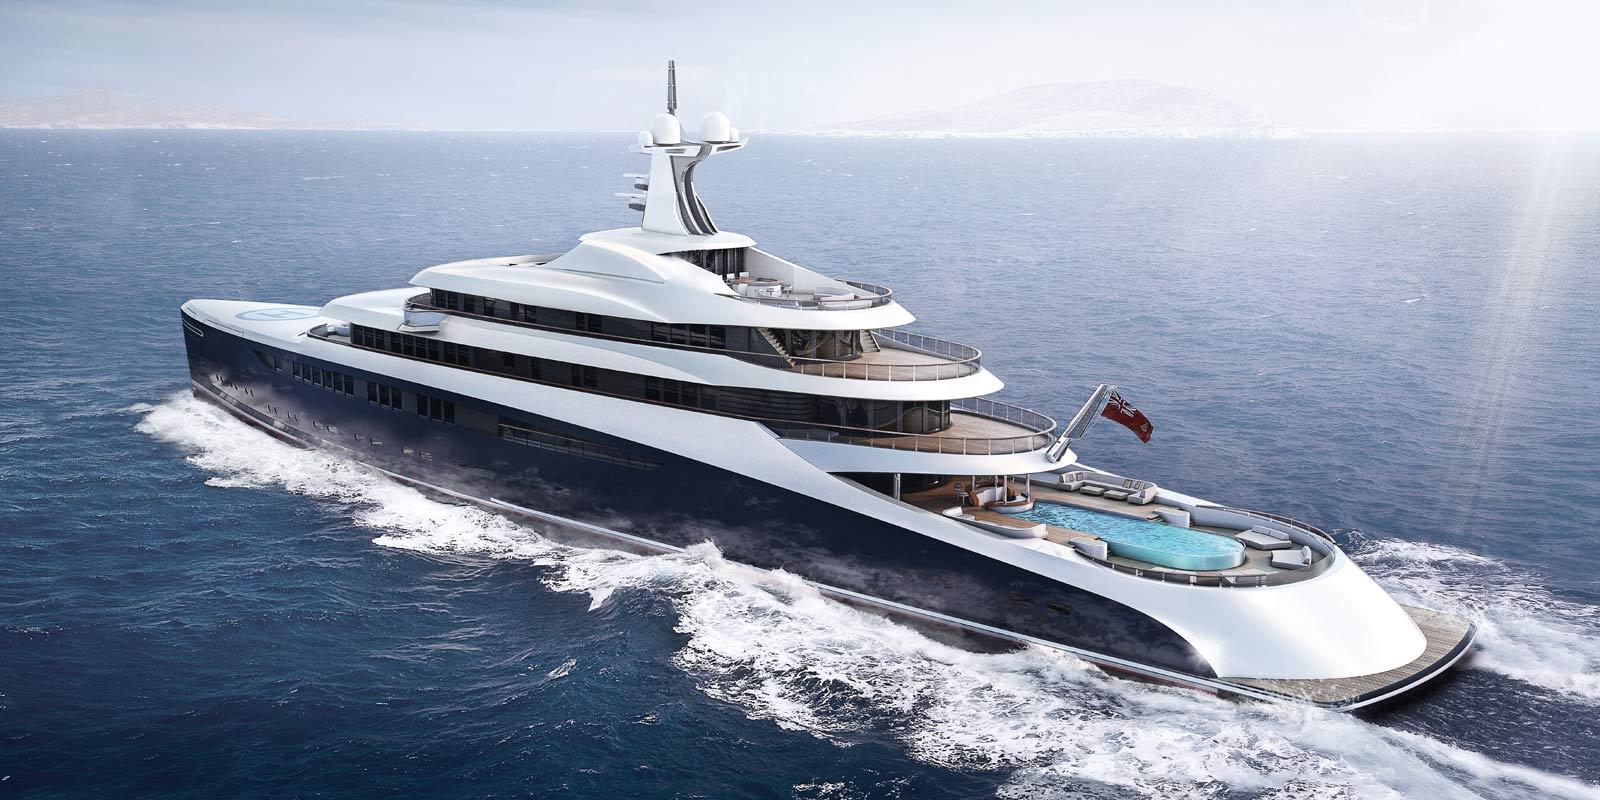 Radiance yacht charter superyacht news for Yacht dekoration